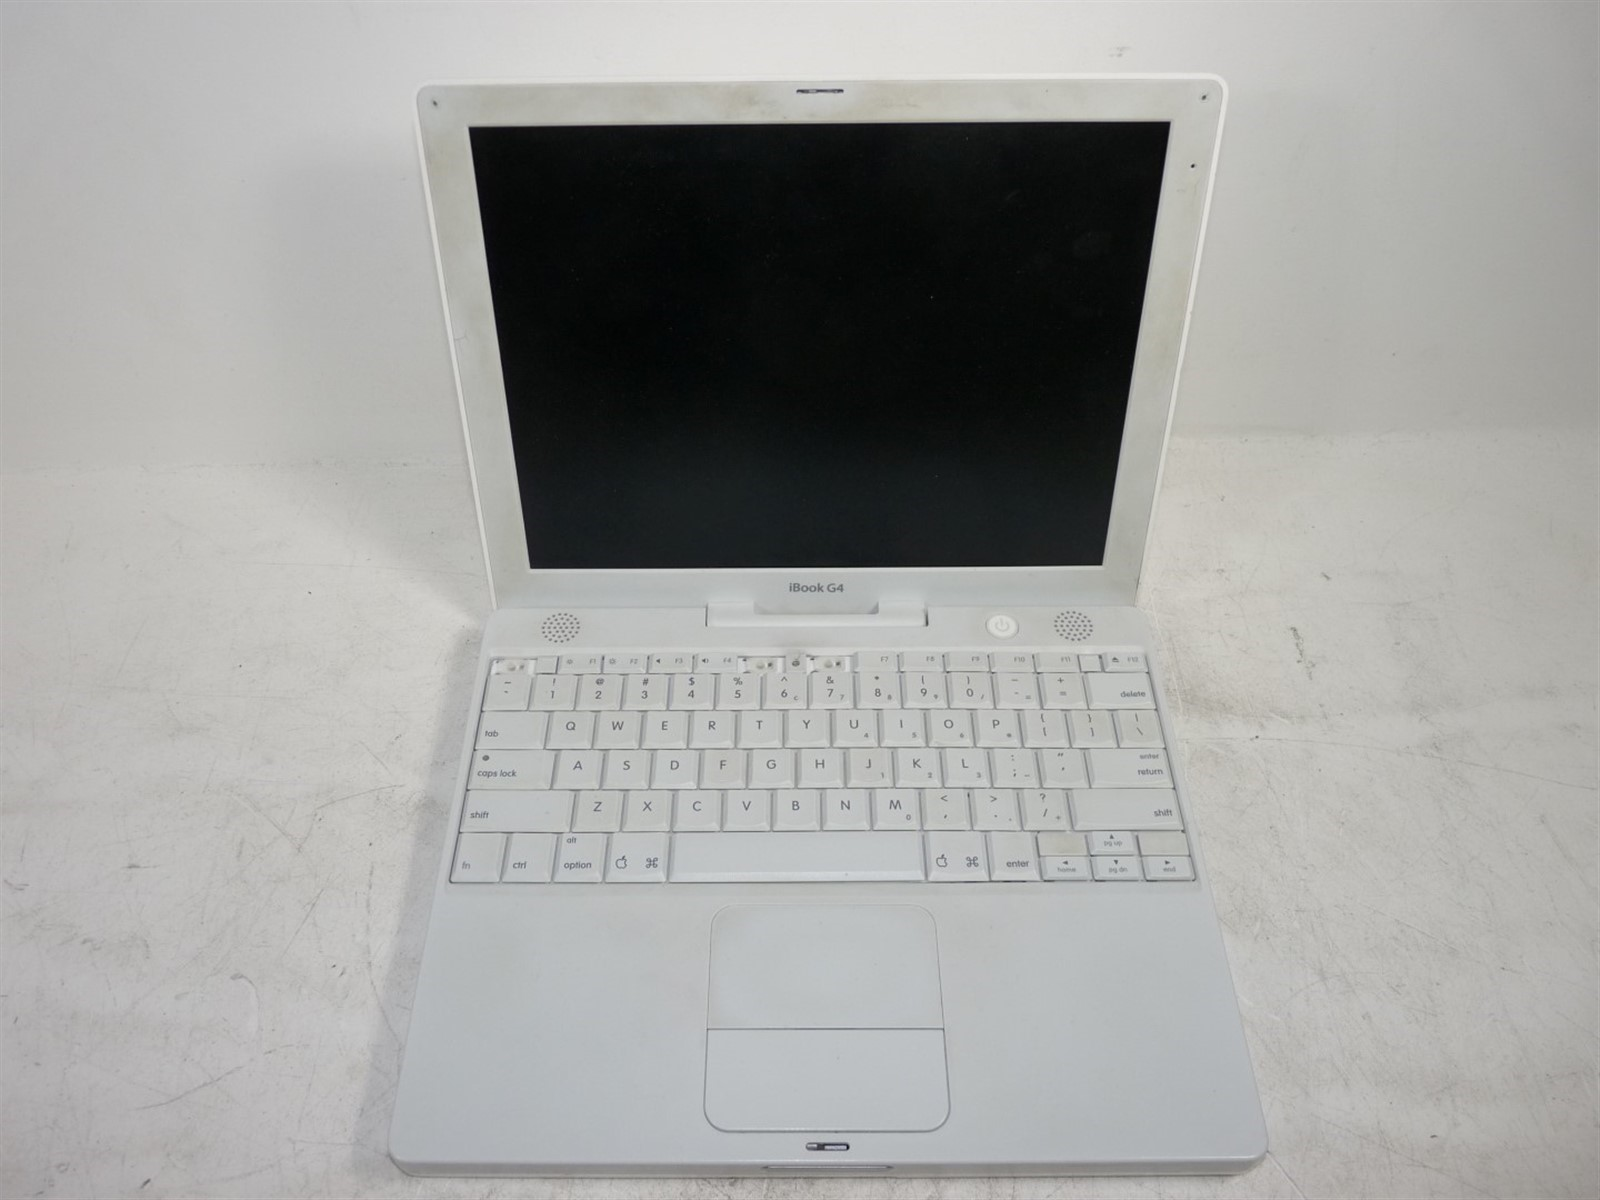 apple ibook g4 a1054 powerpc 1 07ghz 256mb 30gb cd rom post rh ebay com Apple iBook 1999 Apple iBook 2001